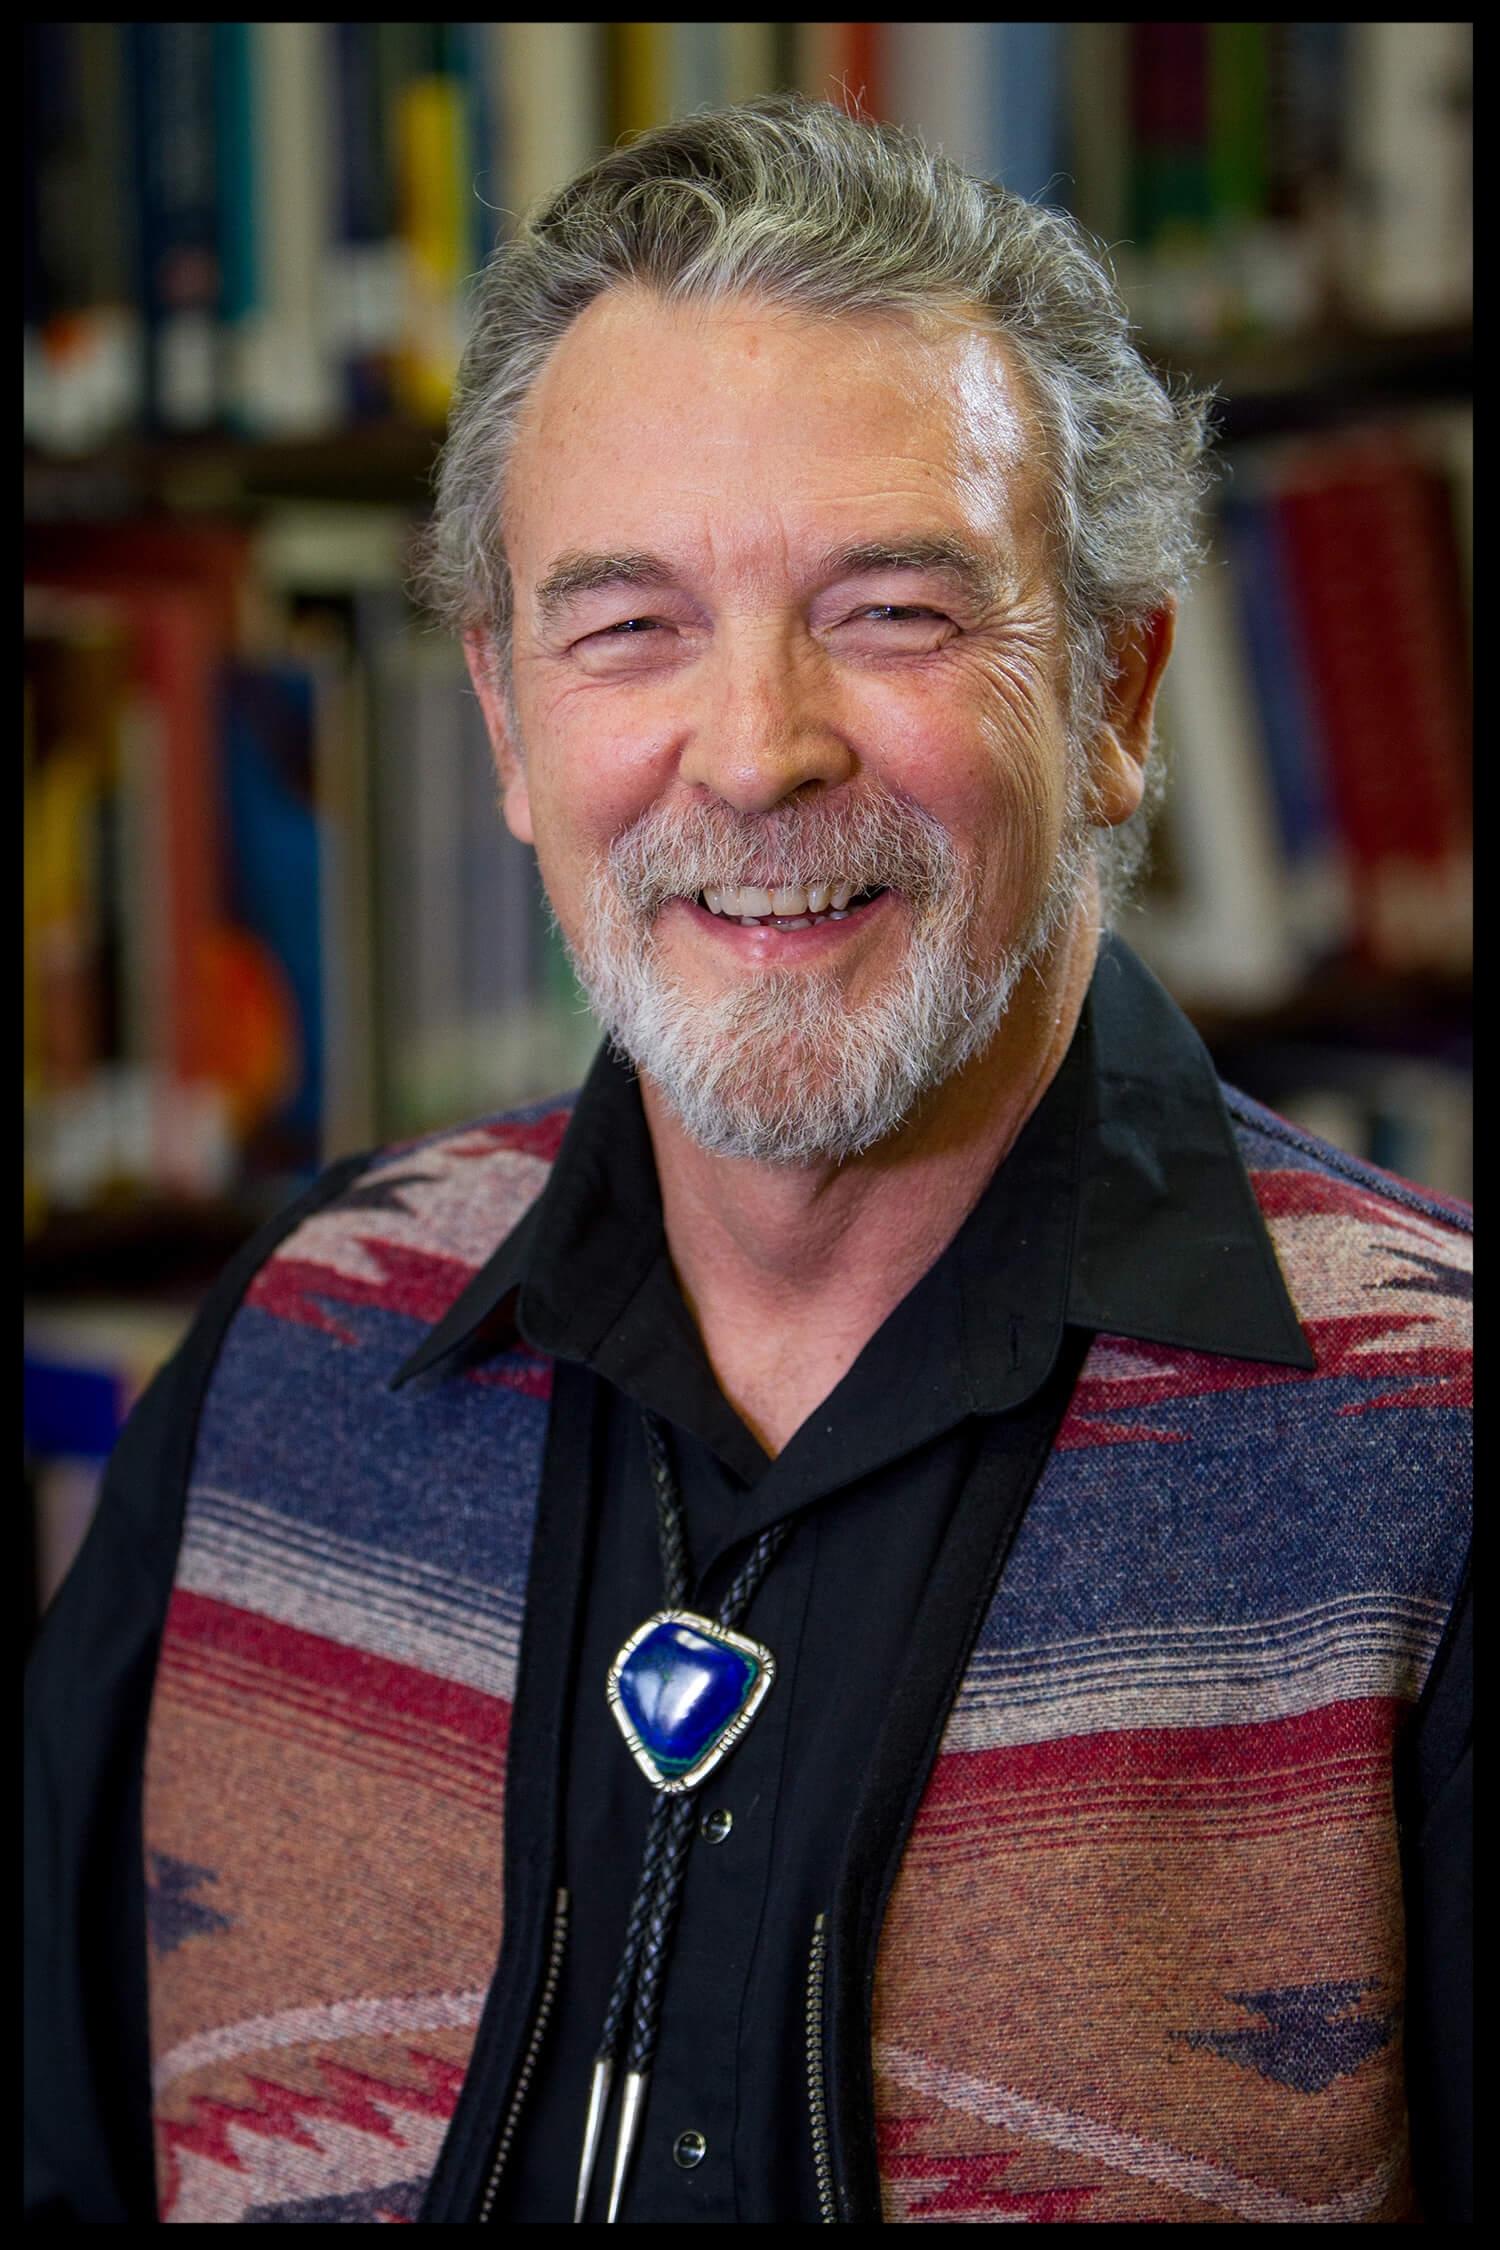 Bill Helm (Image).jpg